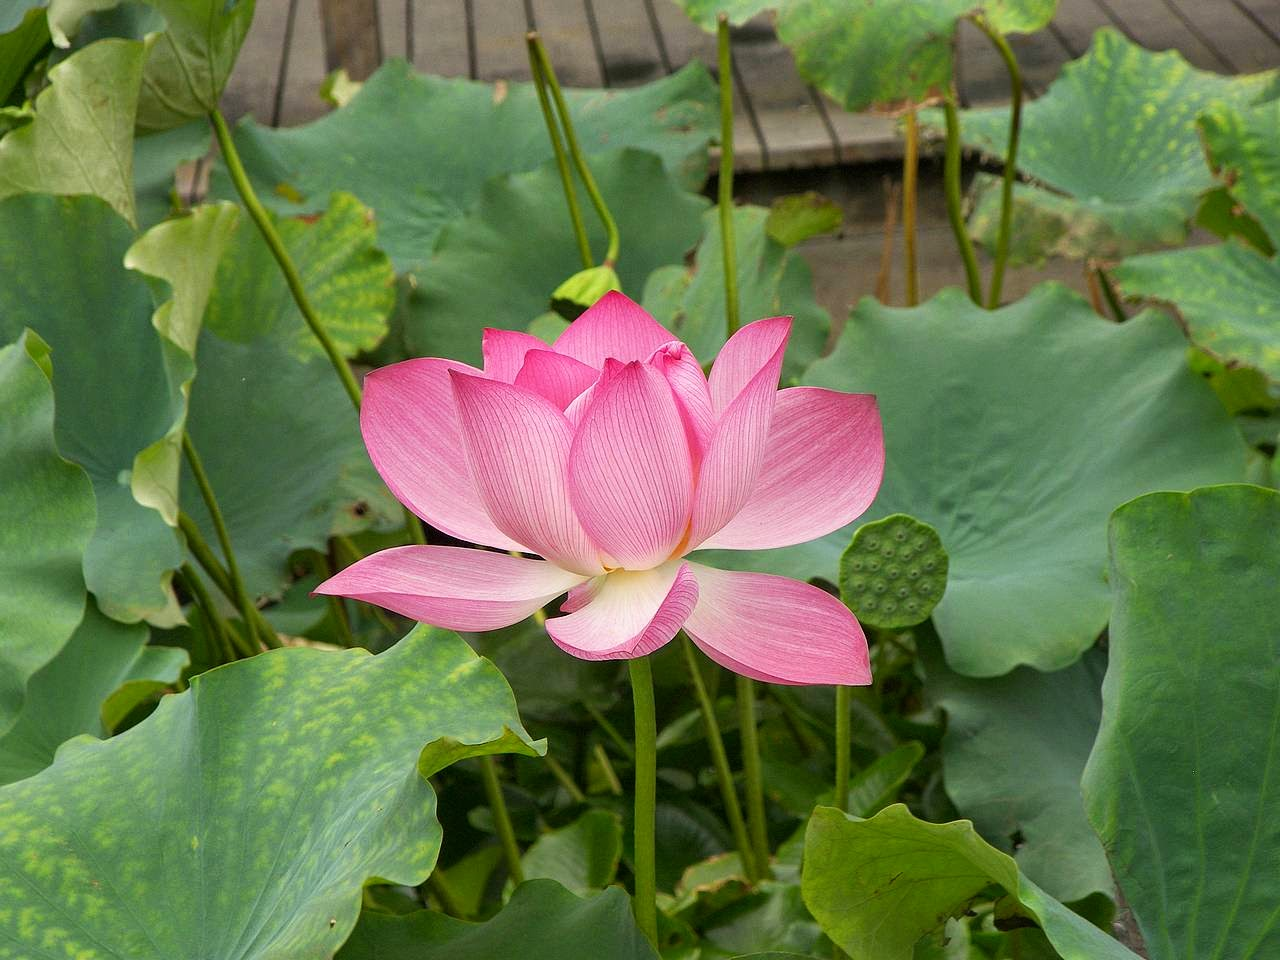 Sometimes As Mine In Garden Manfaat Dan Khasiat Bunga Lotus